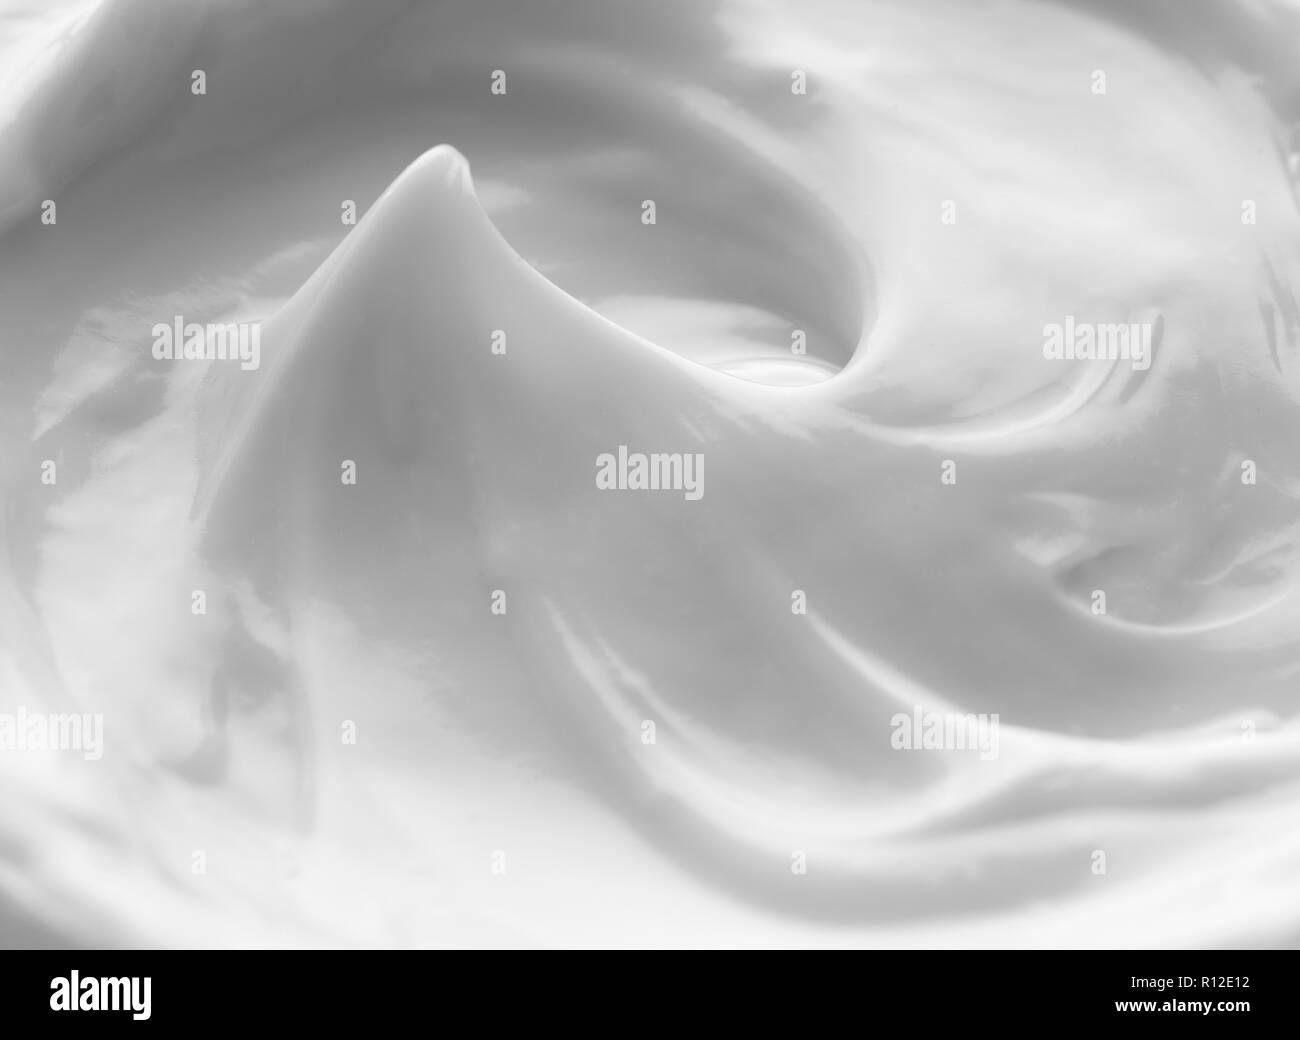 White face cream - Stock Image